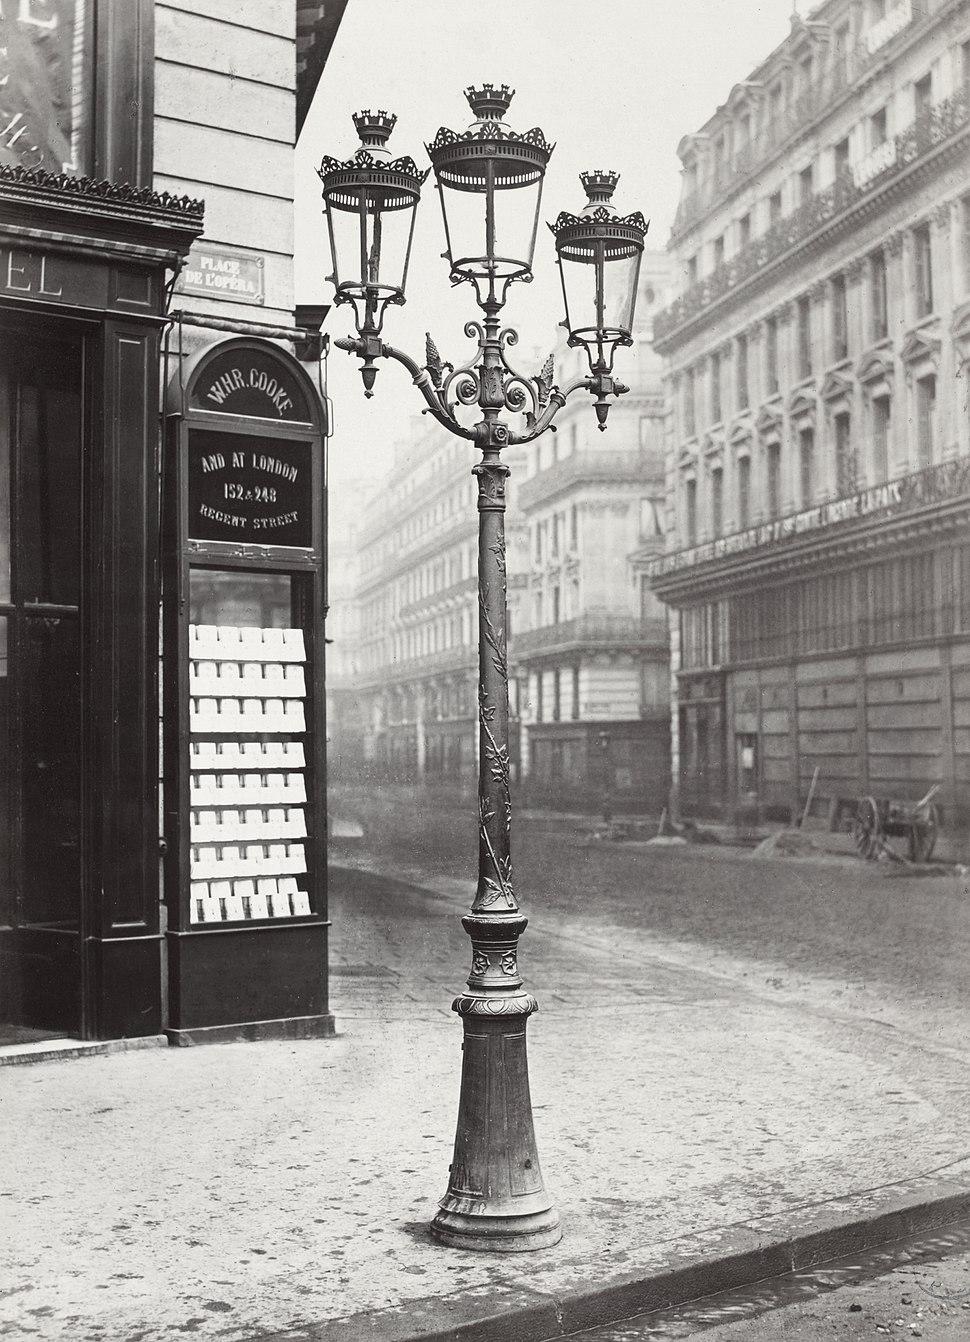 Charles Marville, Place de l'Opéra, 1878